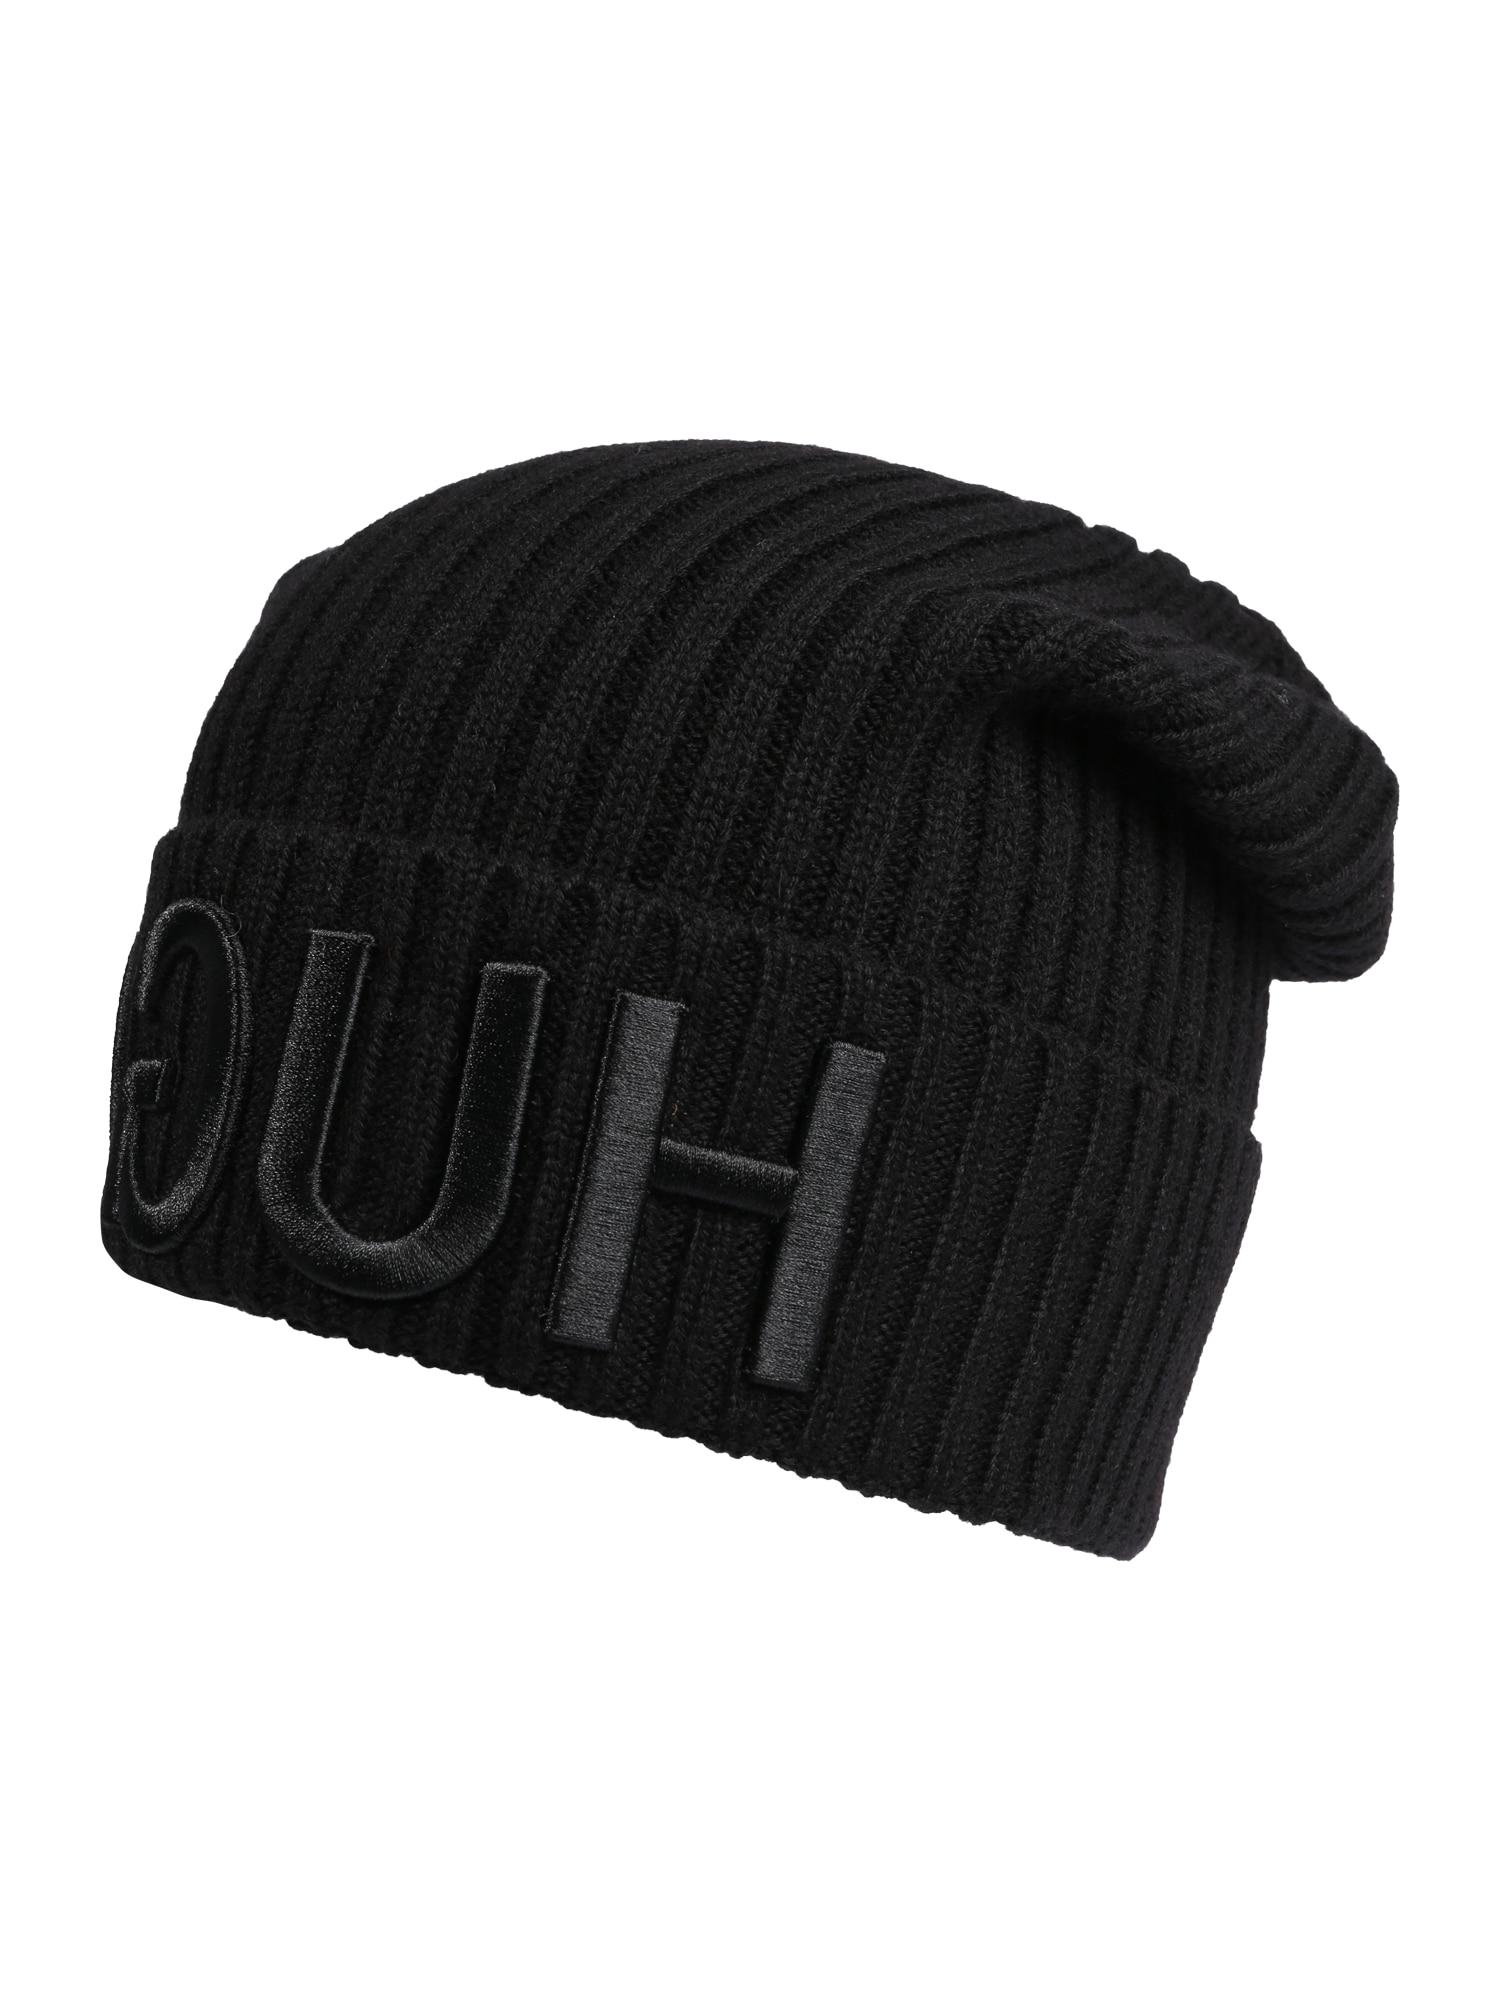 Uniseks beanie van wol met gespiegeld logo